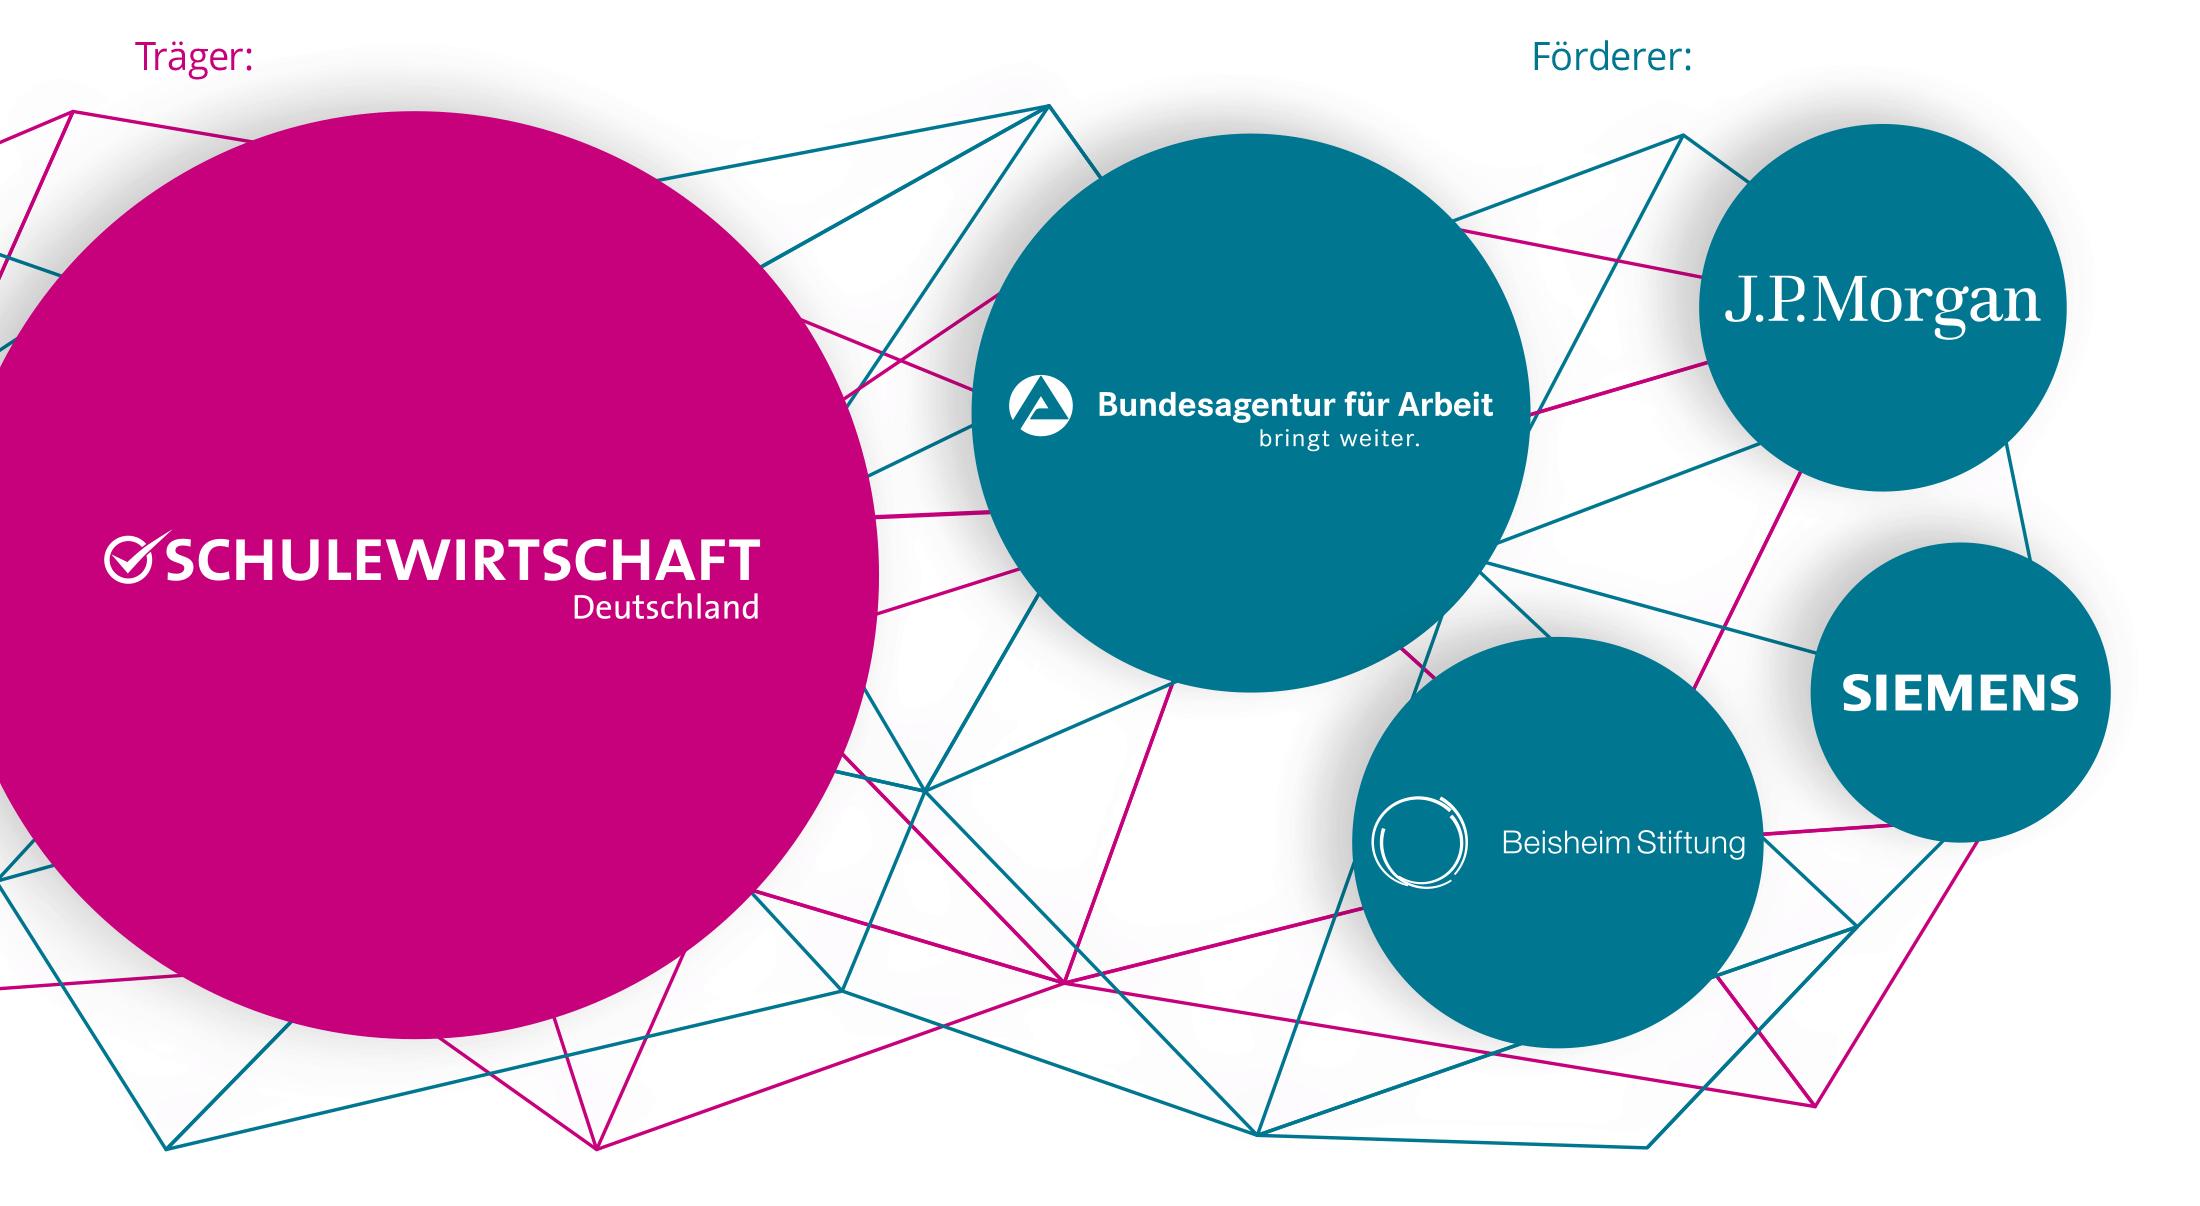 Netzwerktag-footer-5-logos-2019